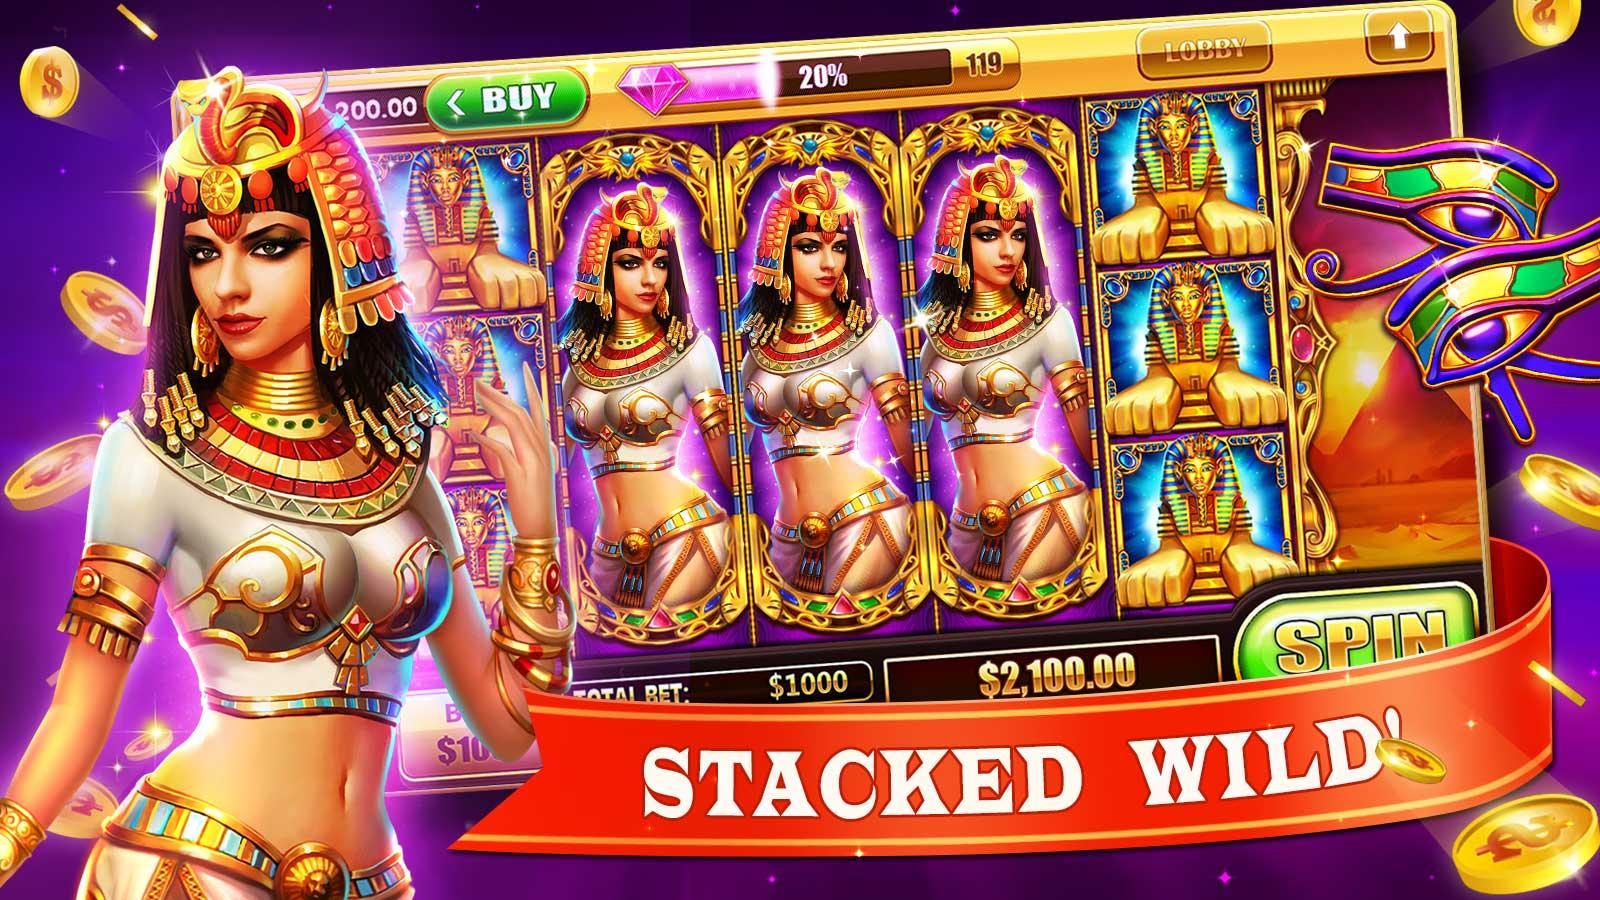 online casinos google play store